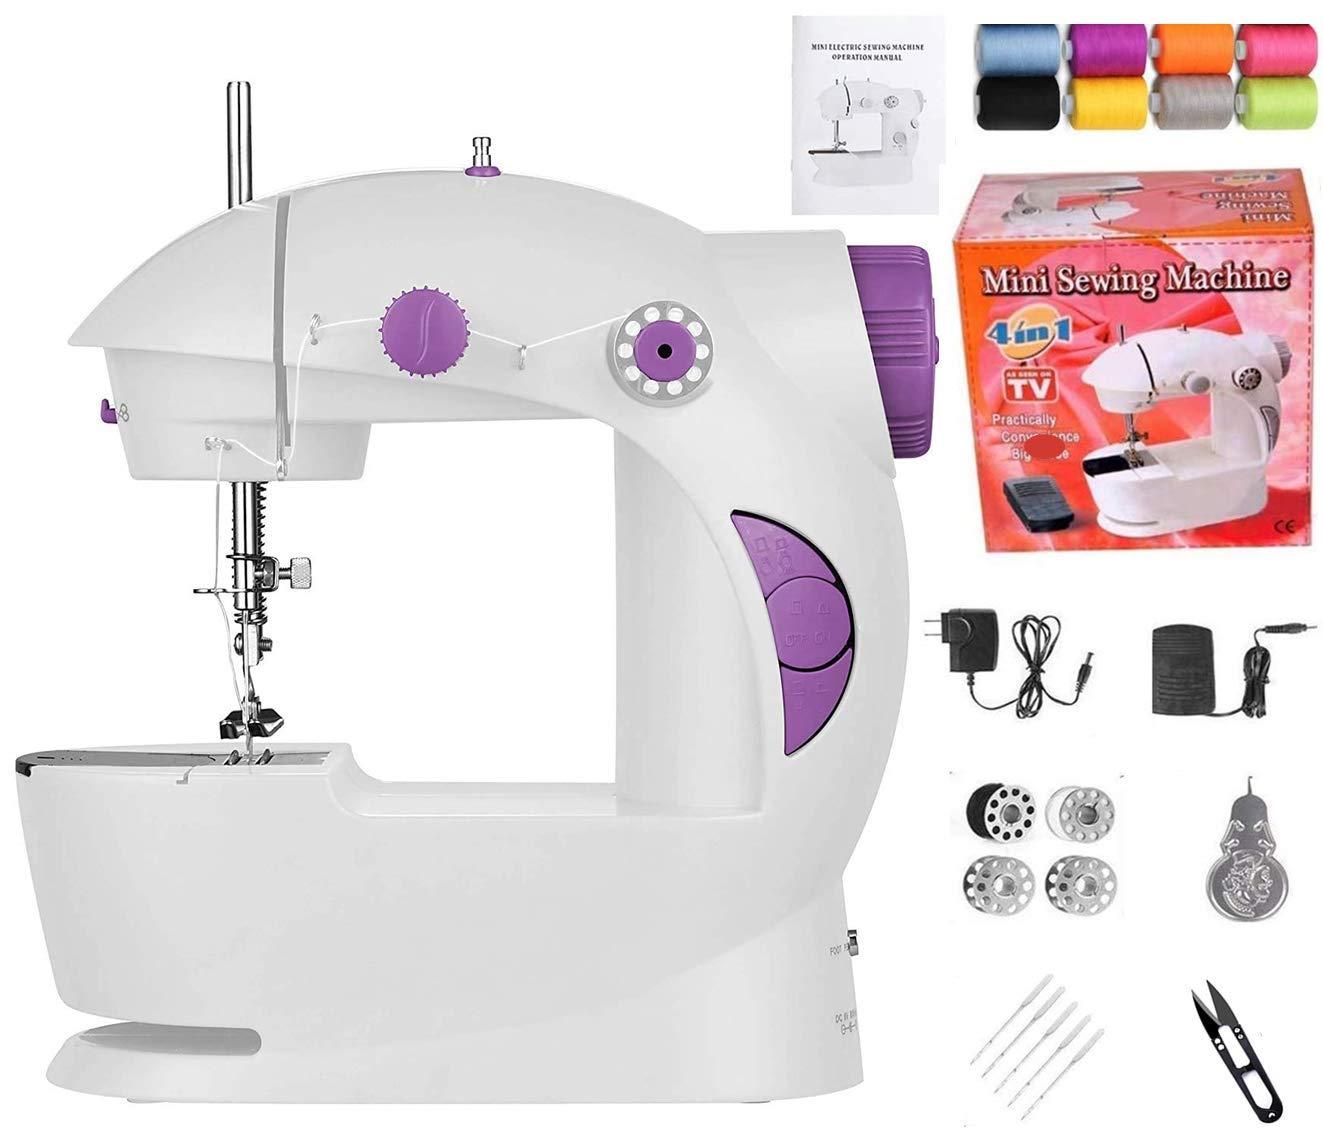 Vivir Portable Sewing Machine for Home